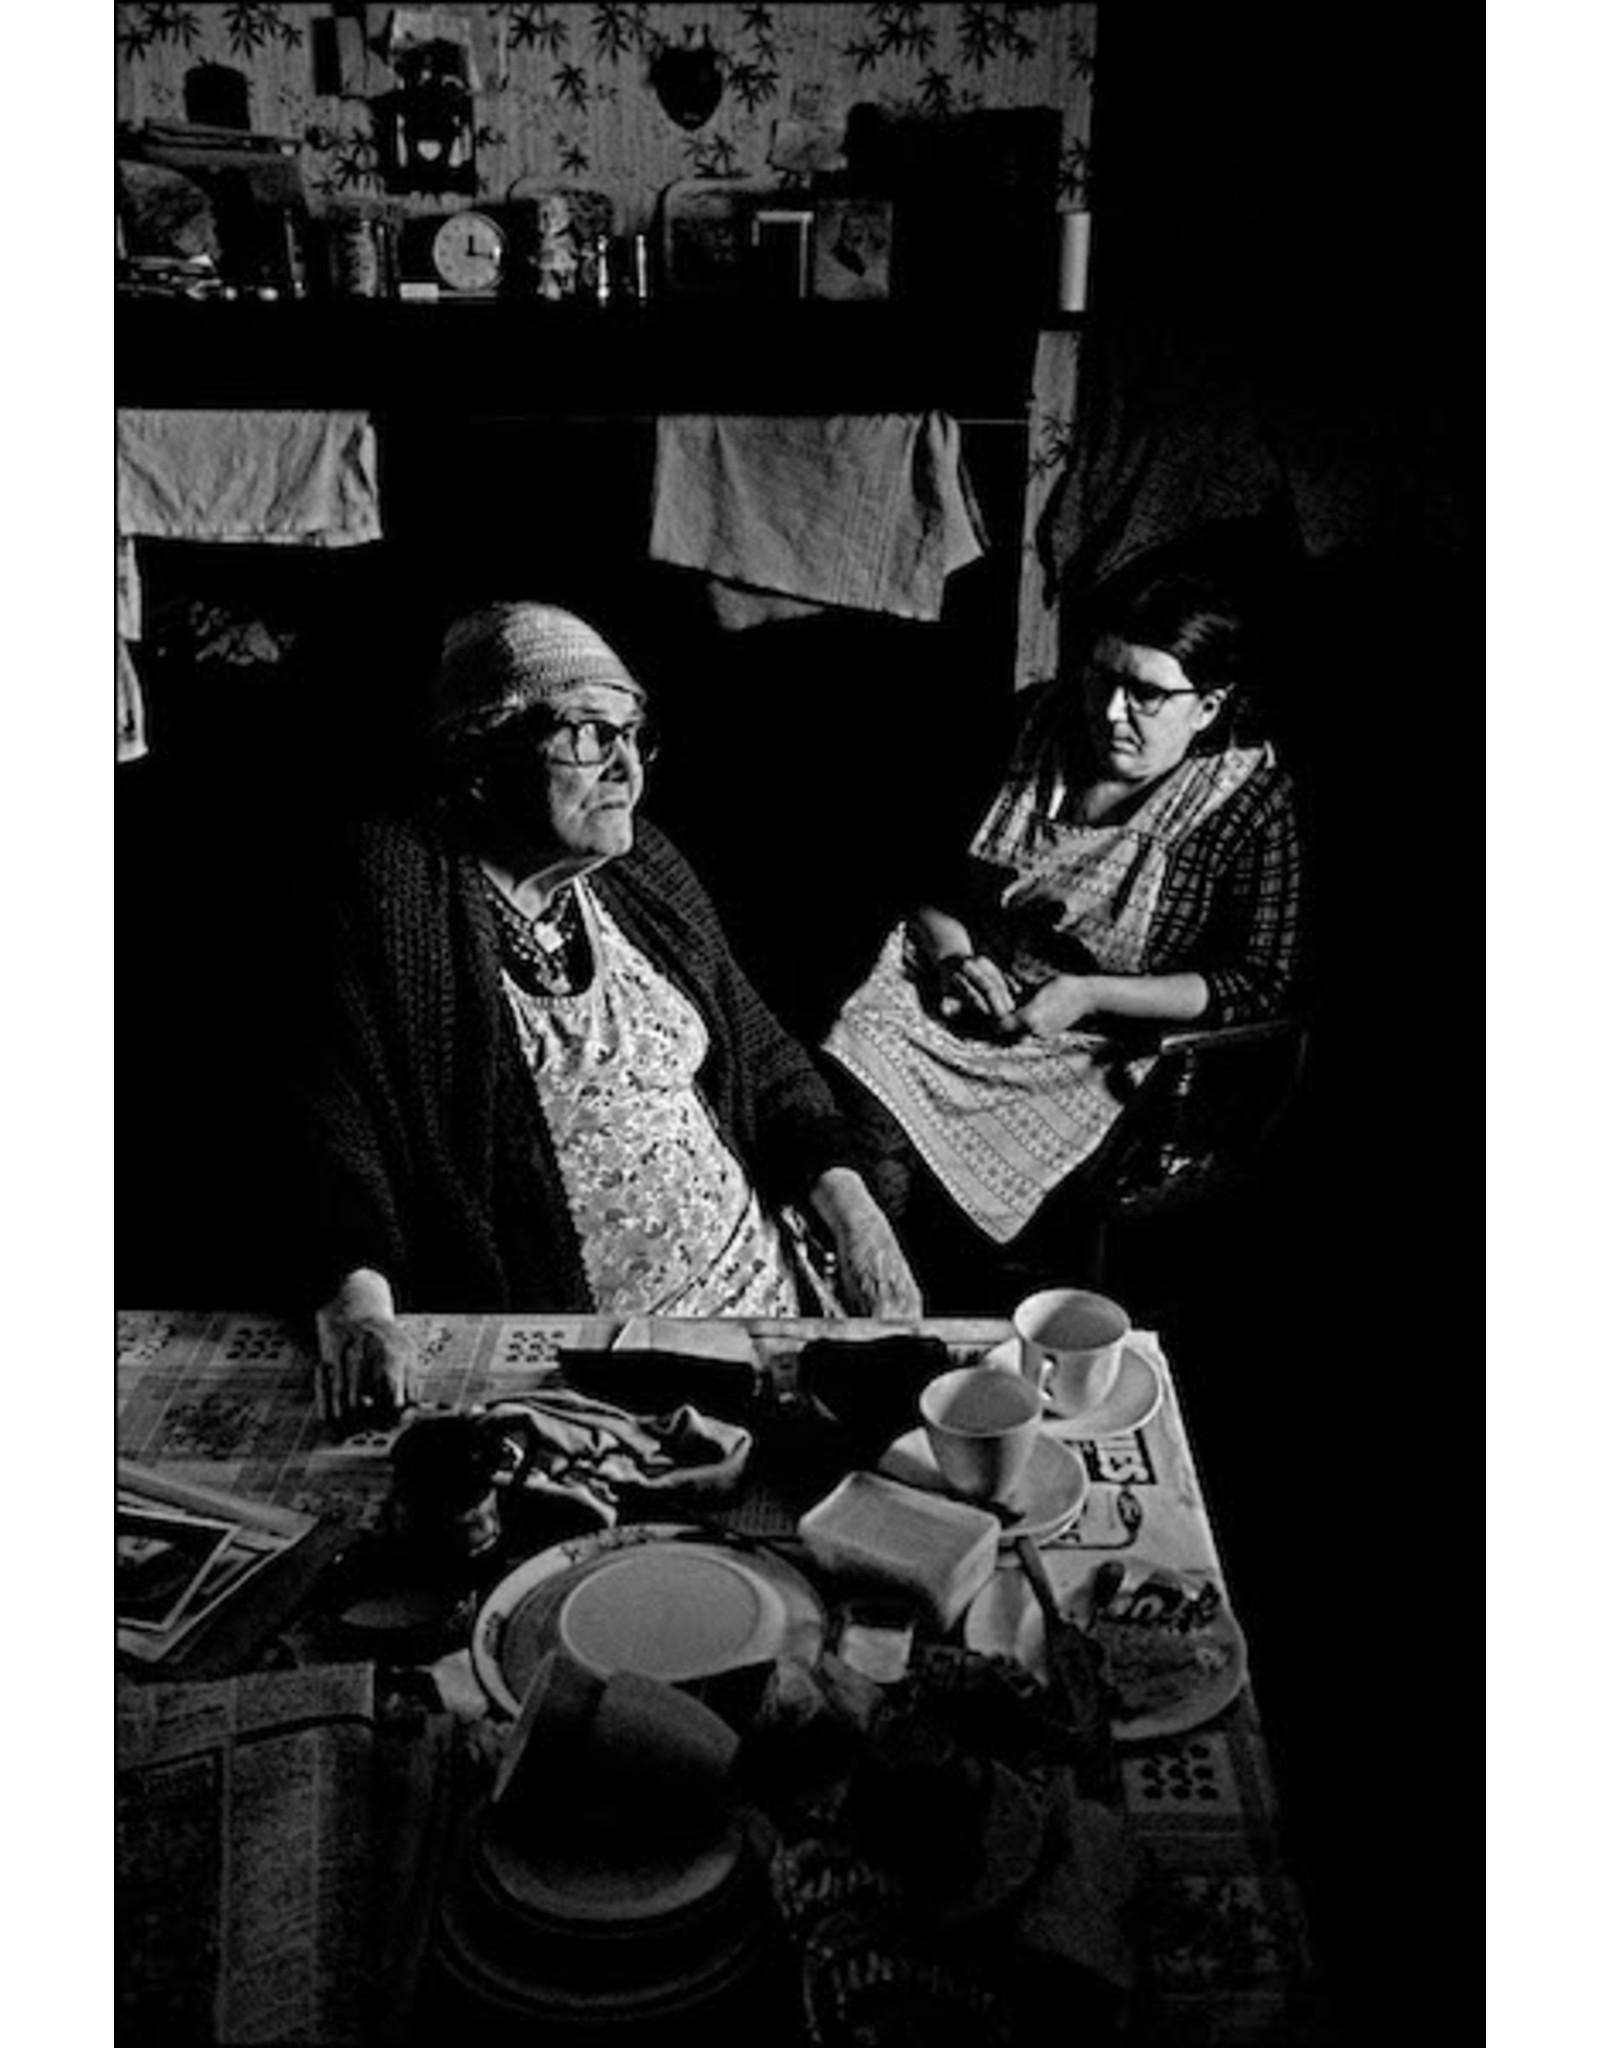 Ian Berry Two Women in the Kitchen, Sunderland. Ian Berry (10)